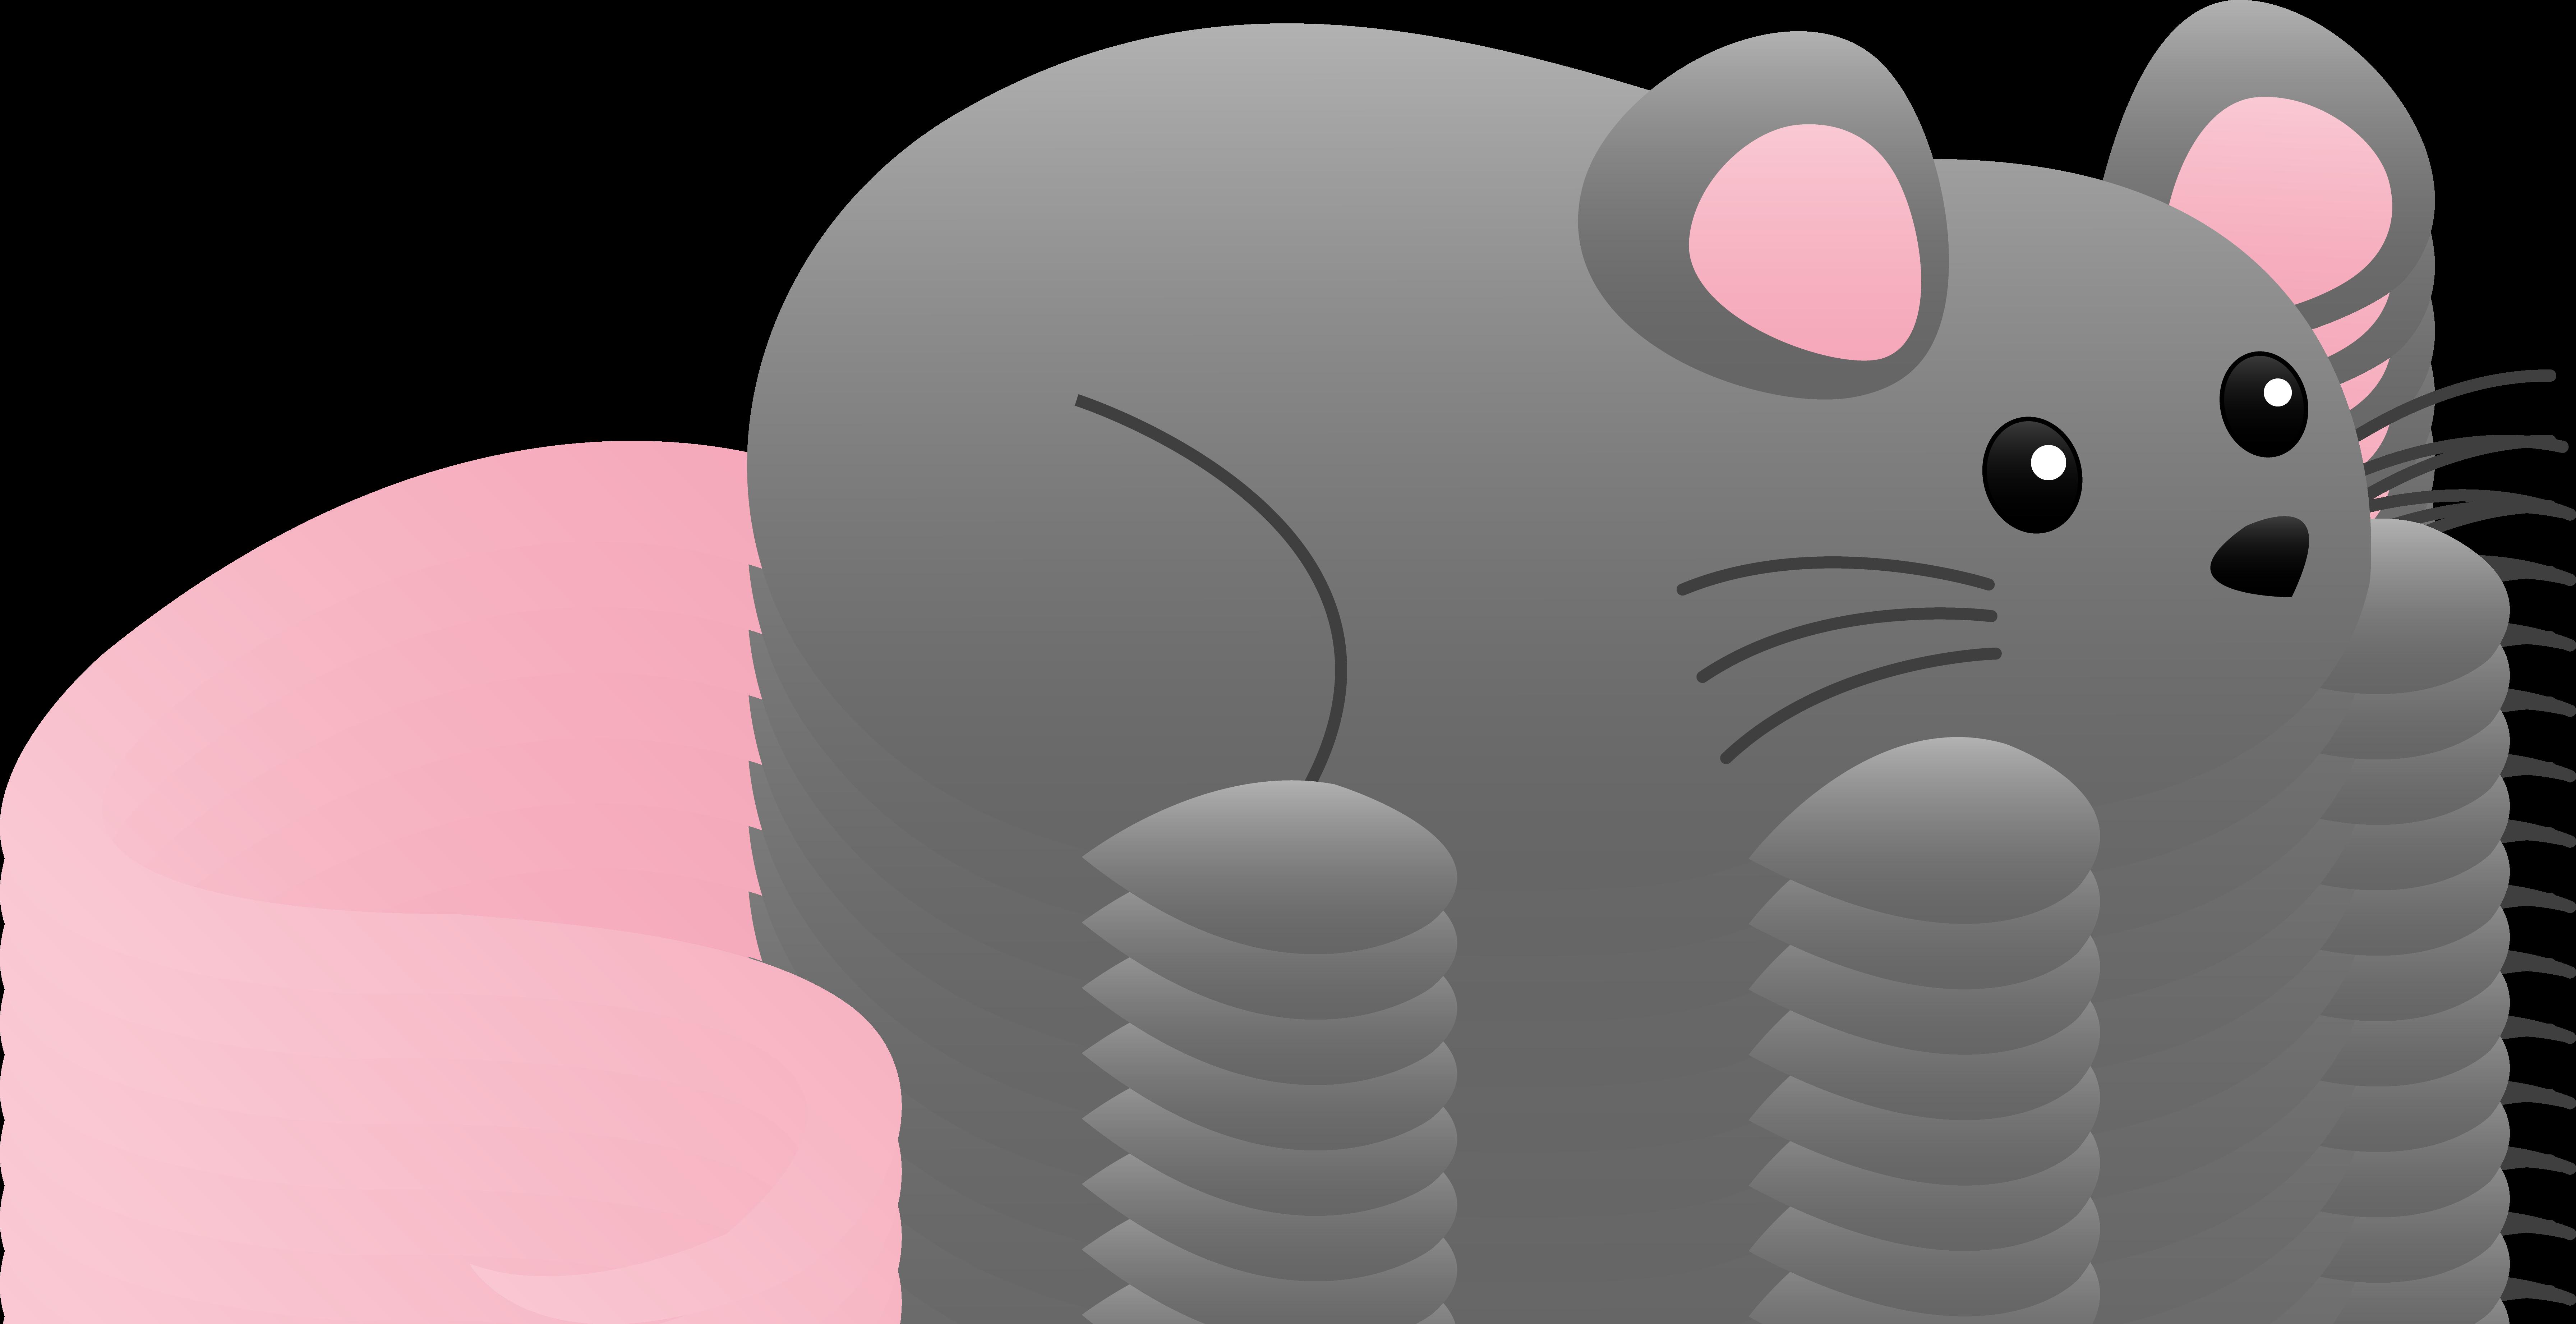 clipart mouse